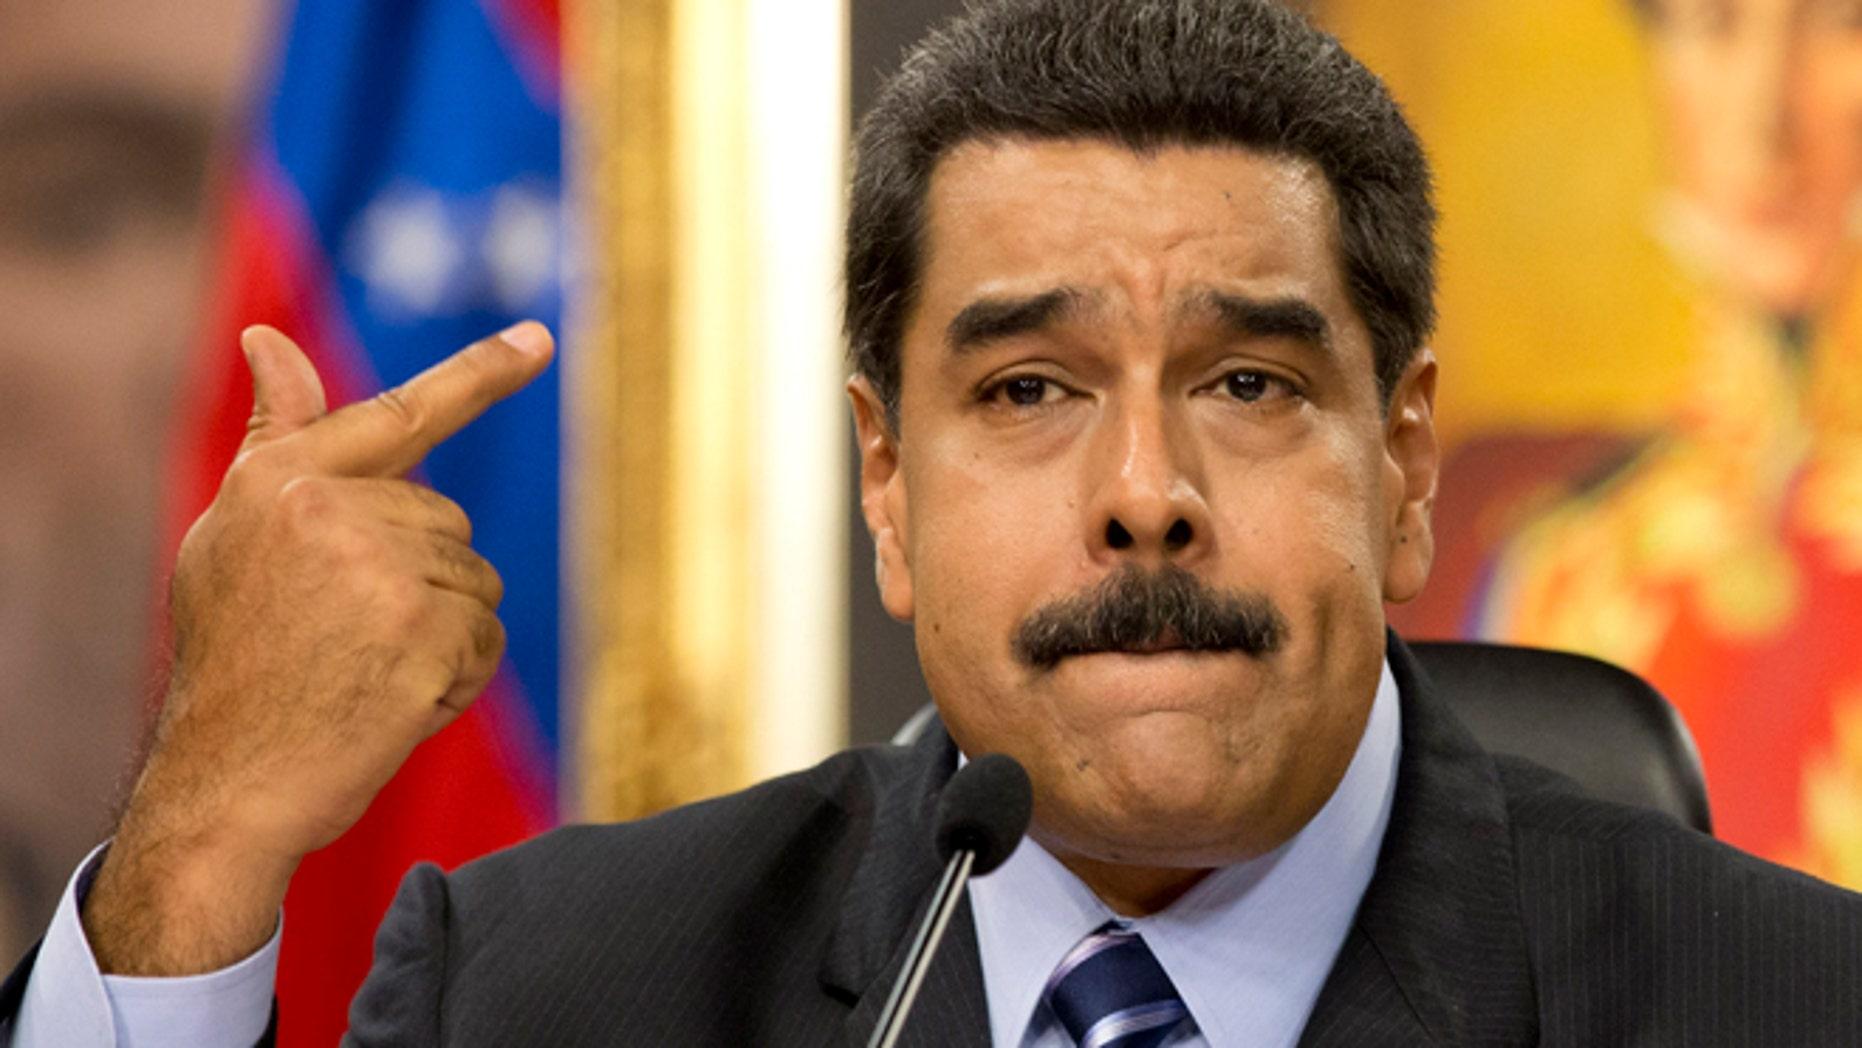 Venezuela's President Maduro at the Miraflores presidential palace in Caracas, Venezuela, Tuesday, May 17, 2016.